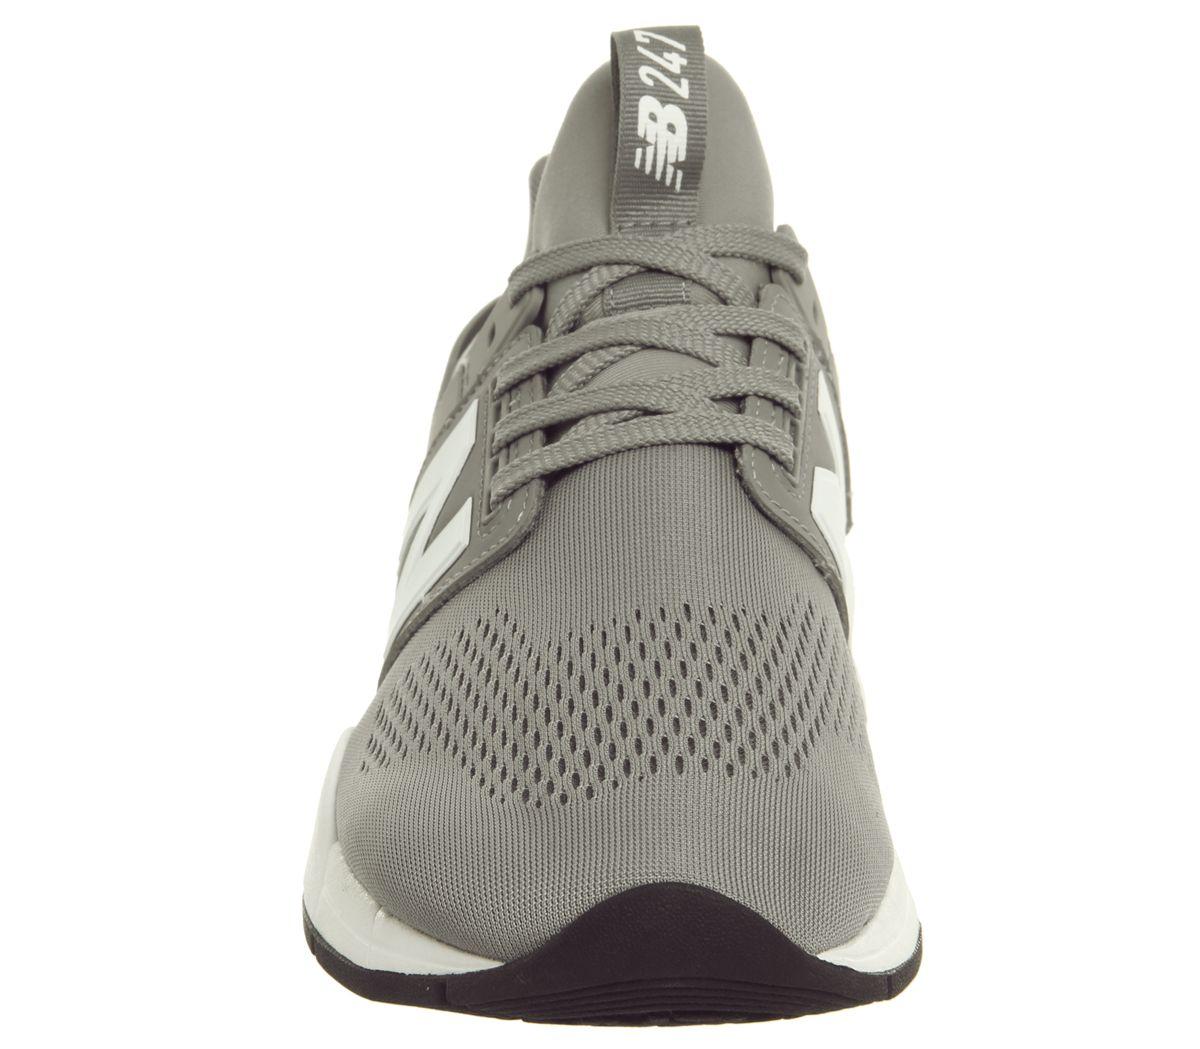 New-Balance-247V2-Baskets-Marblehead-Baskets-Chaussures miniature 6